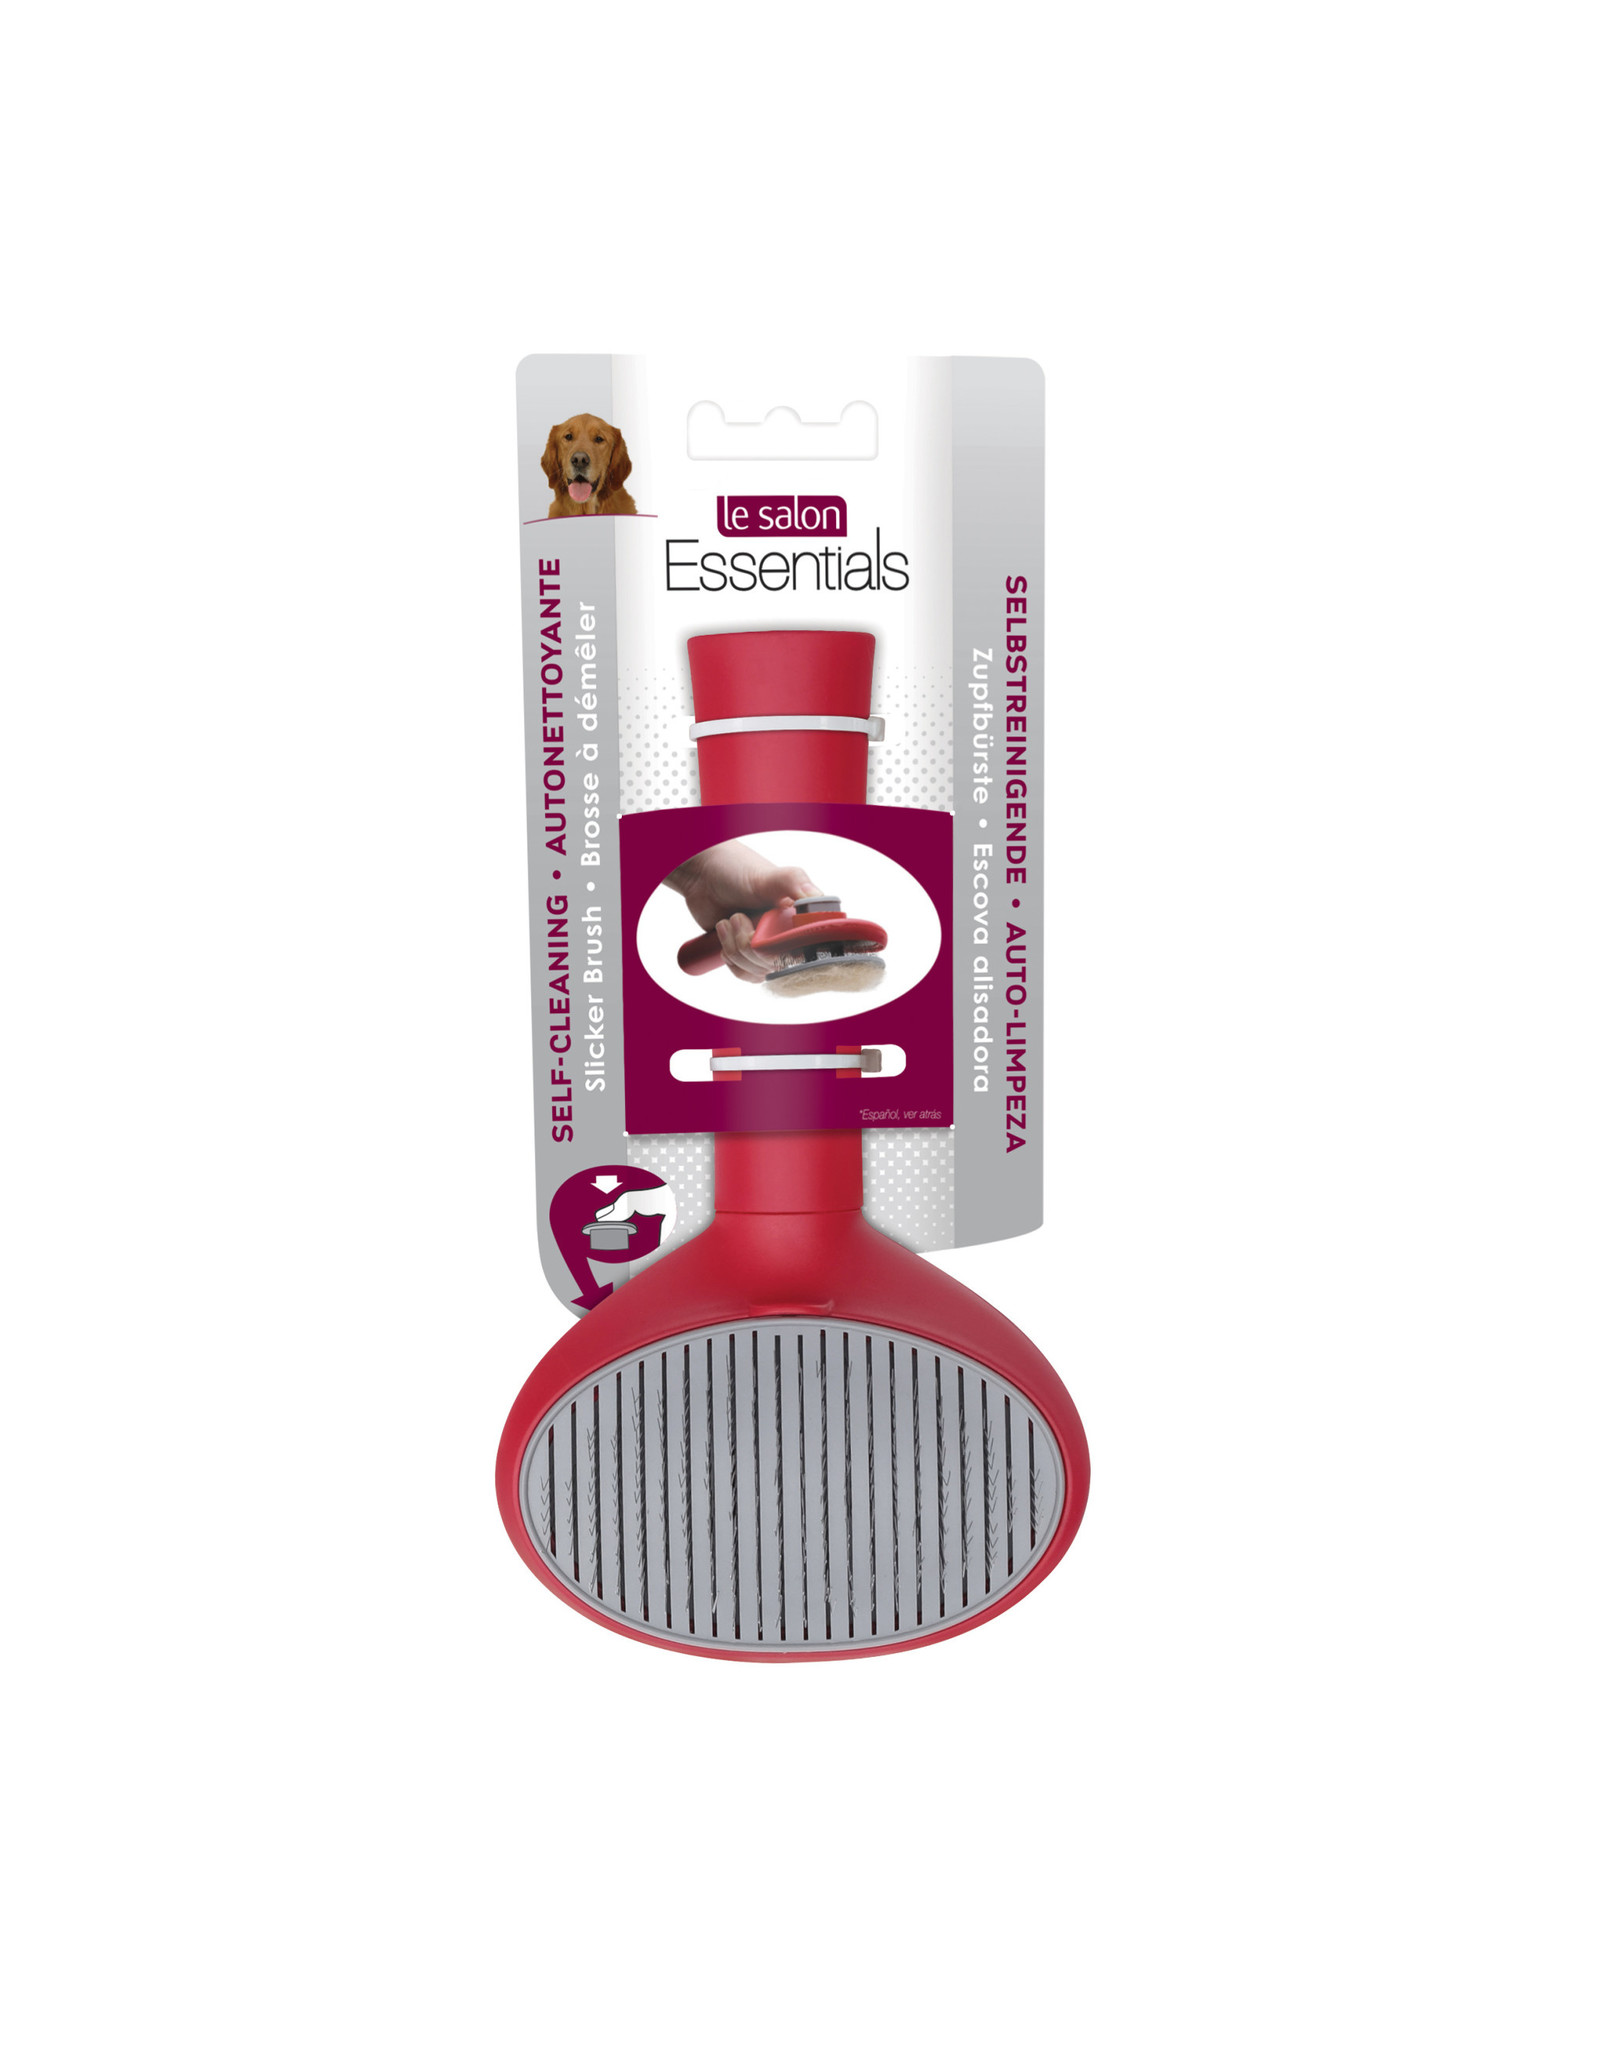 Le Salon LeSalon Self-Cleaning Slicker Brush for Dogs